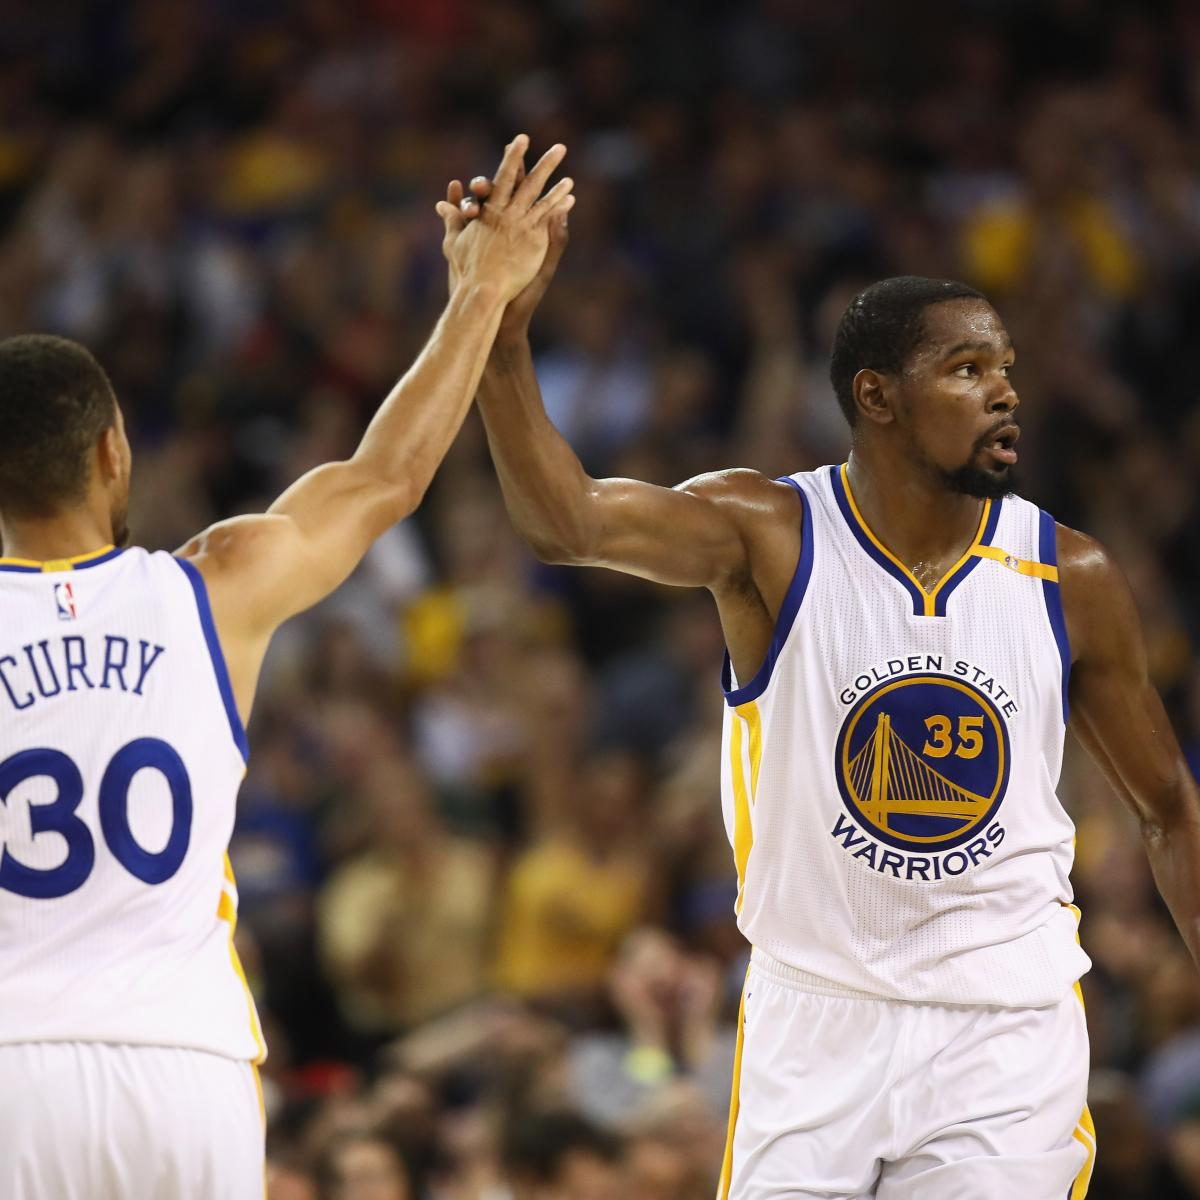 Nuggets Warriors Game: Golden State Warriors Vs. Denver Nuggets: Live Score